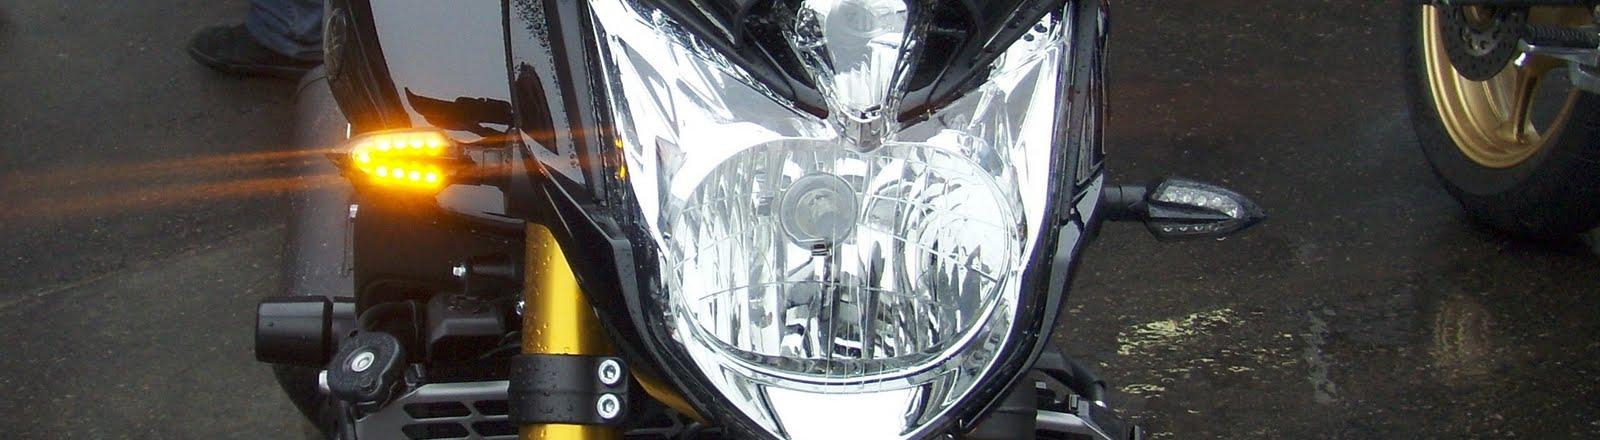 Yamahagenuineparts Com Rear Led Turn Signals Fazer 8 Fz8